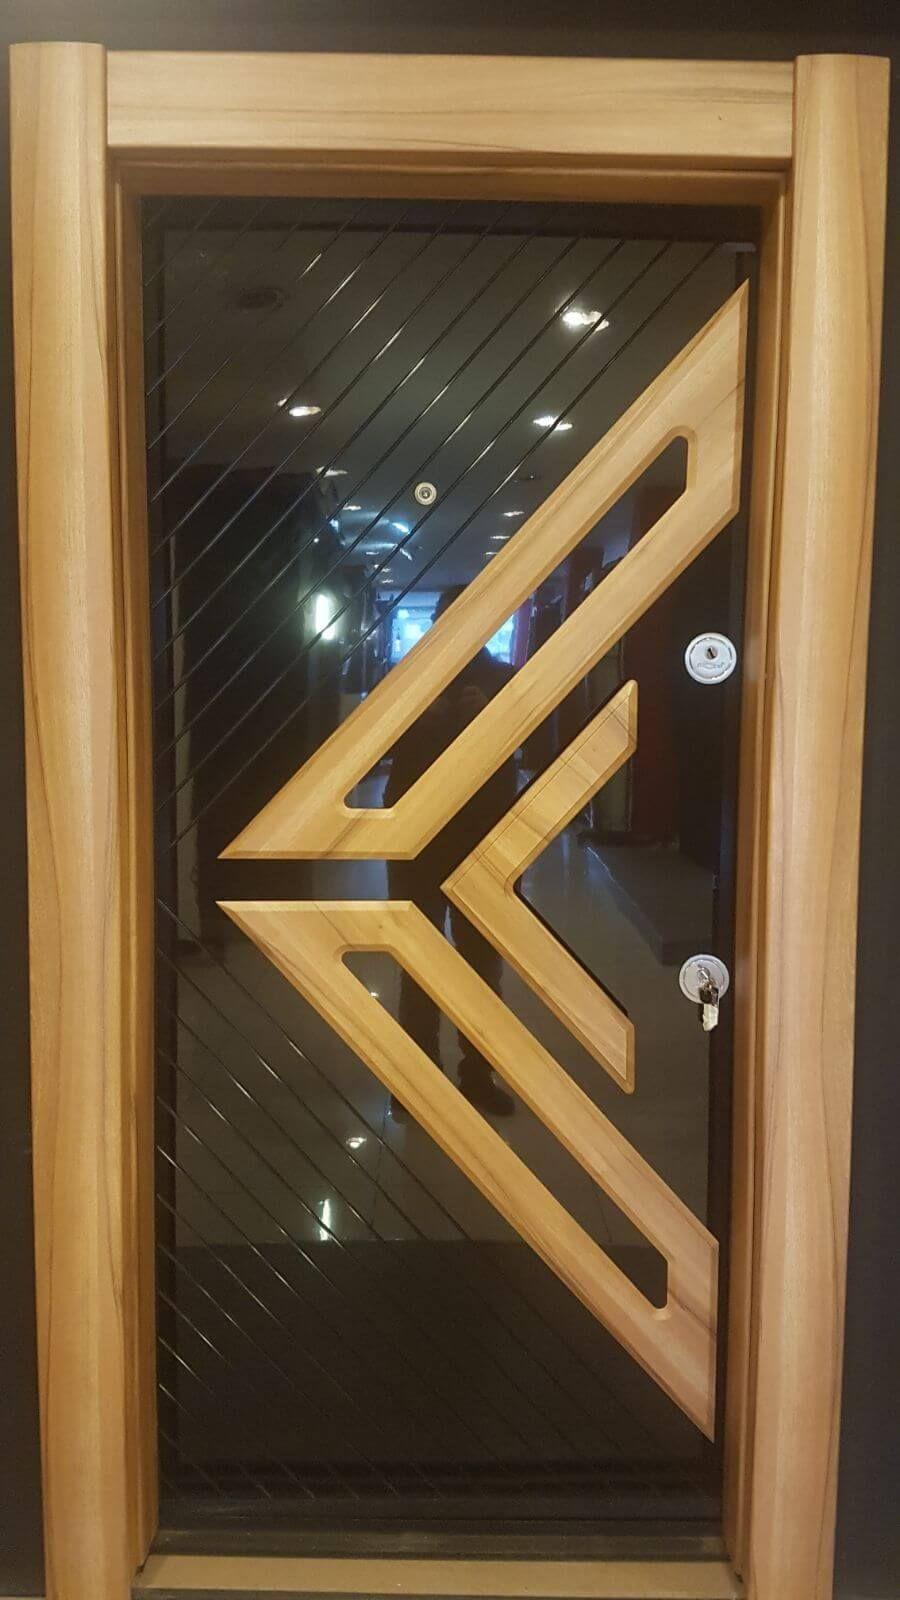 50 Contemporary Modern Interior Door Designs For Most: Top 50 Modern Wooden Door Design Ideas You Want To Choose